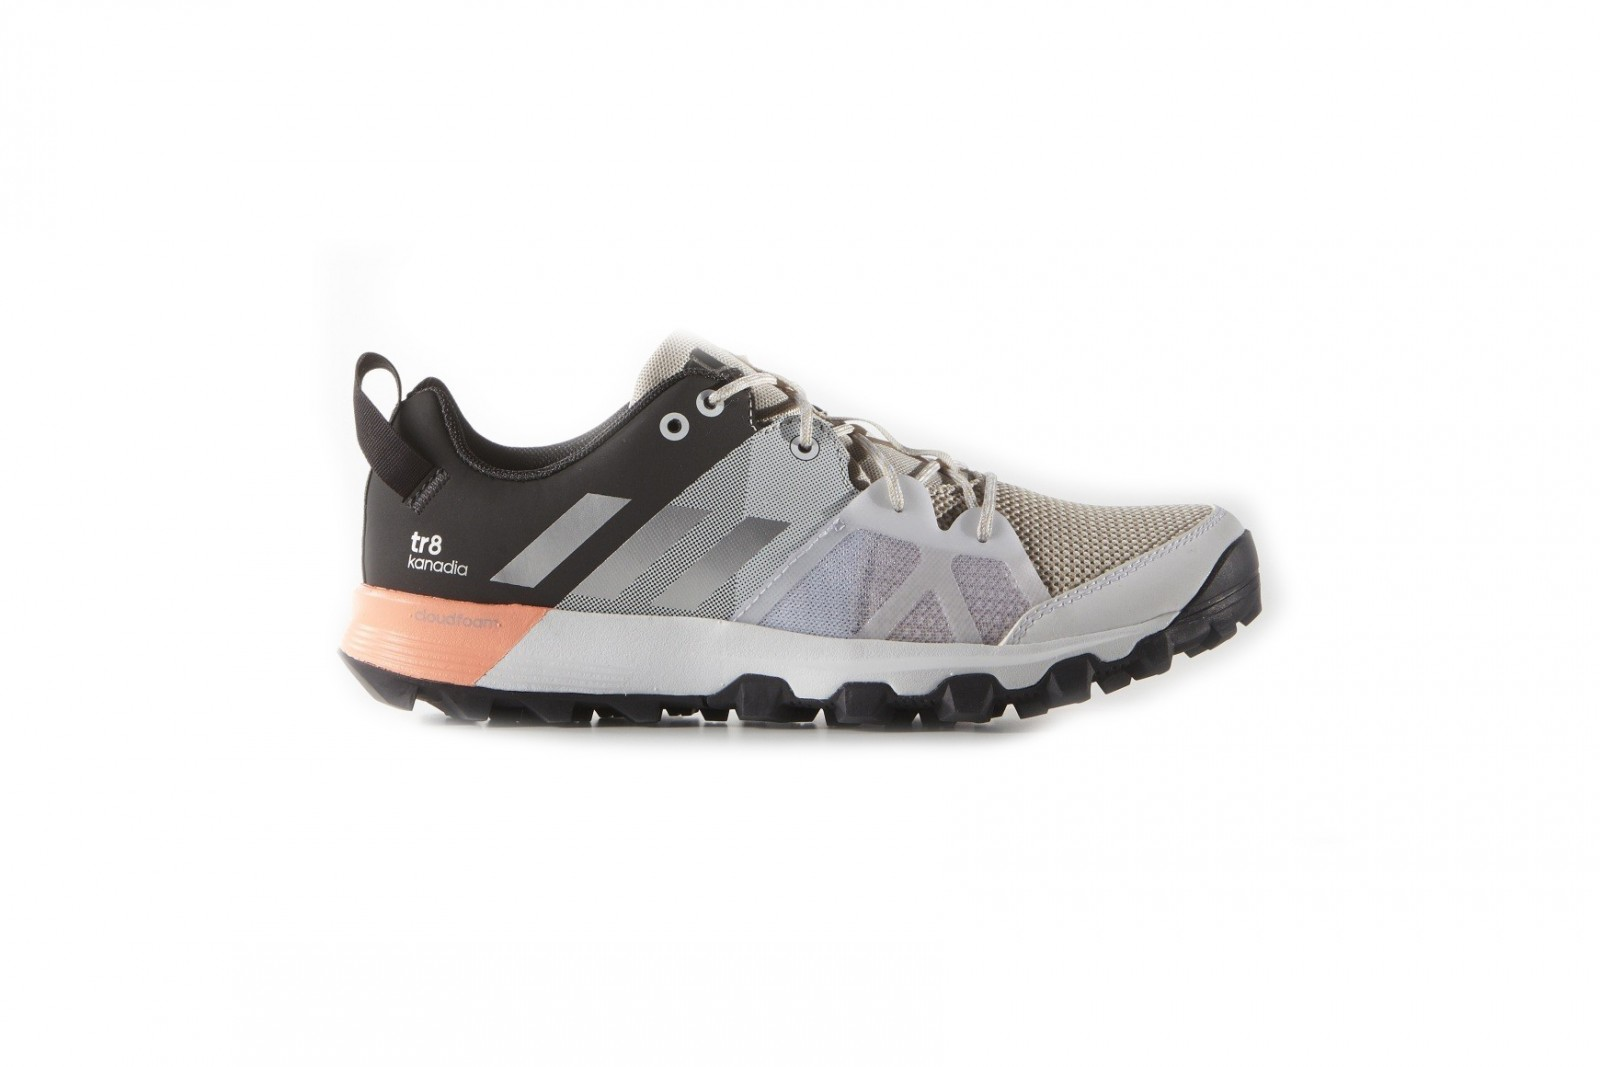 065bc1e609a3e4 Dámské běžecké boty adidas kanadia 8 tr w   D-Sport